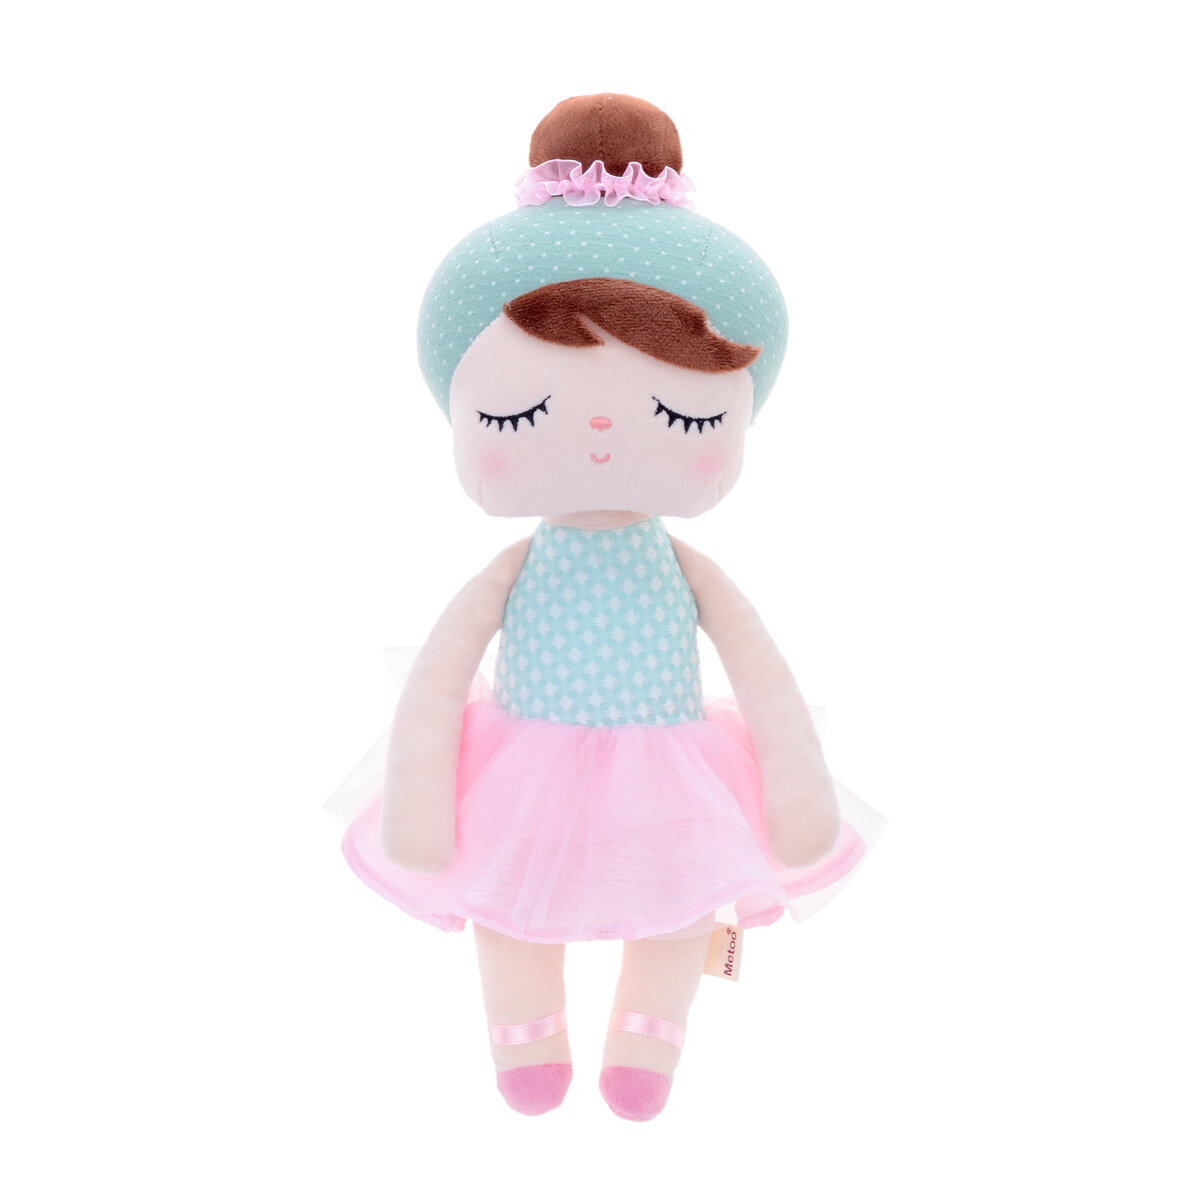 Boneca MeToo Angela Lai Ballet Bup Baby 40cm Original